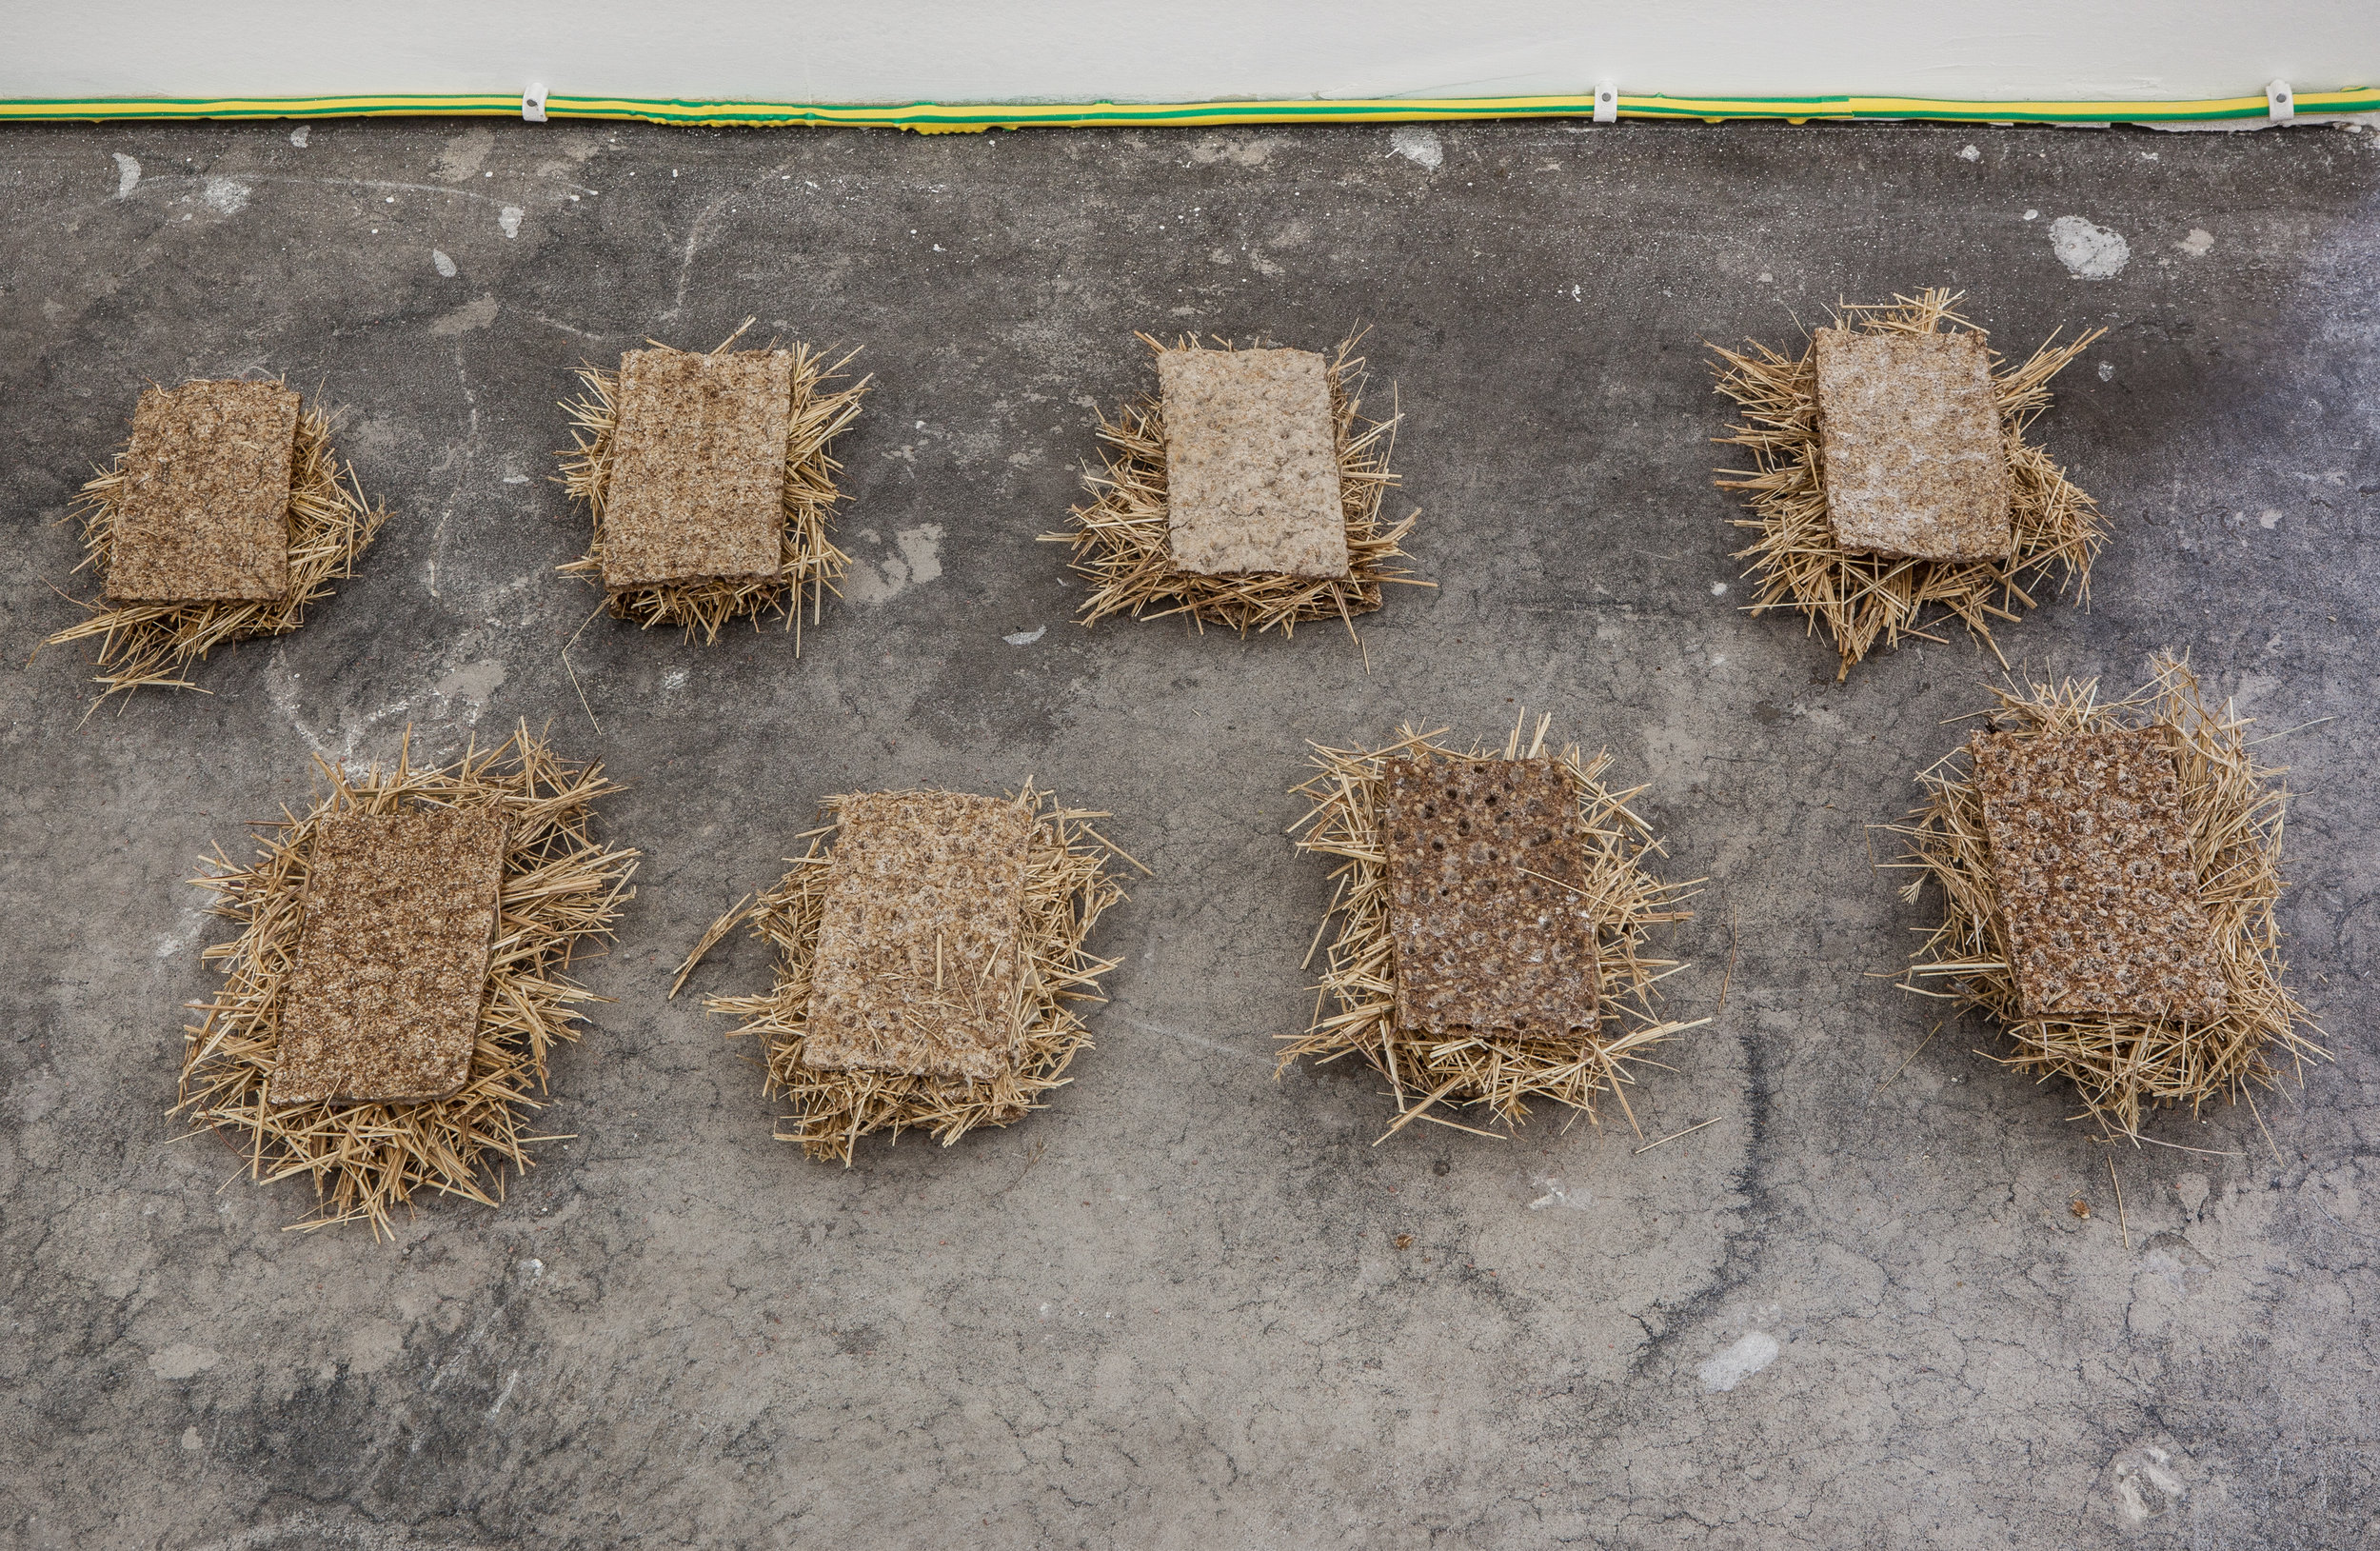 Eternal Sunshine , 2018, Straw mulch, crispbread, 8 part 40.64 x 71.12 cm